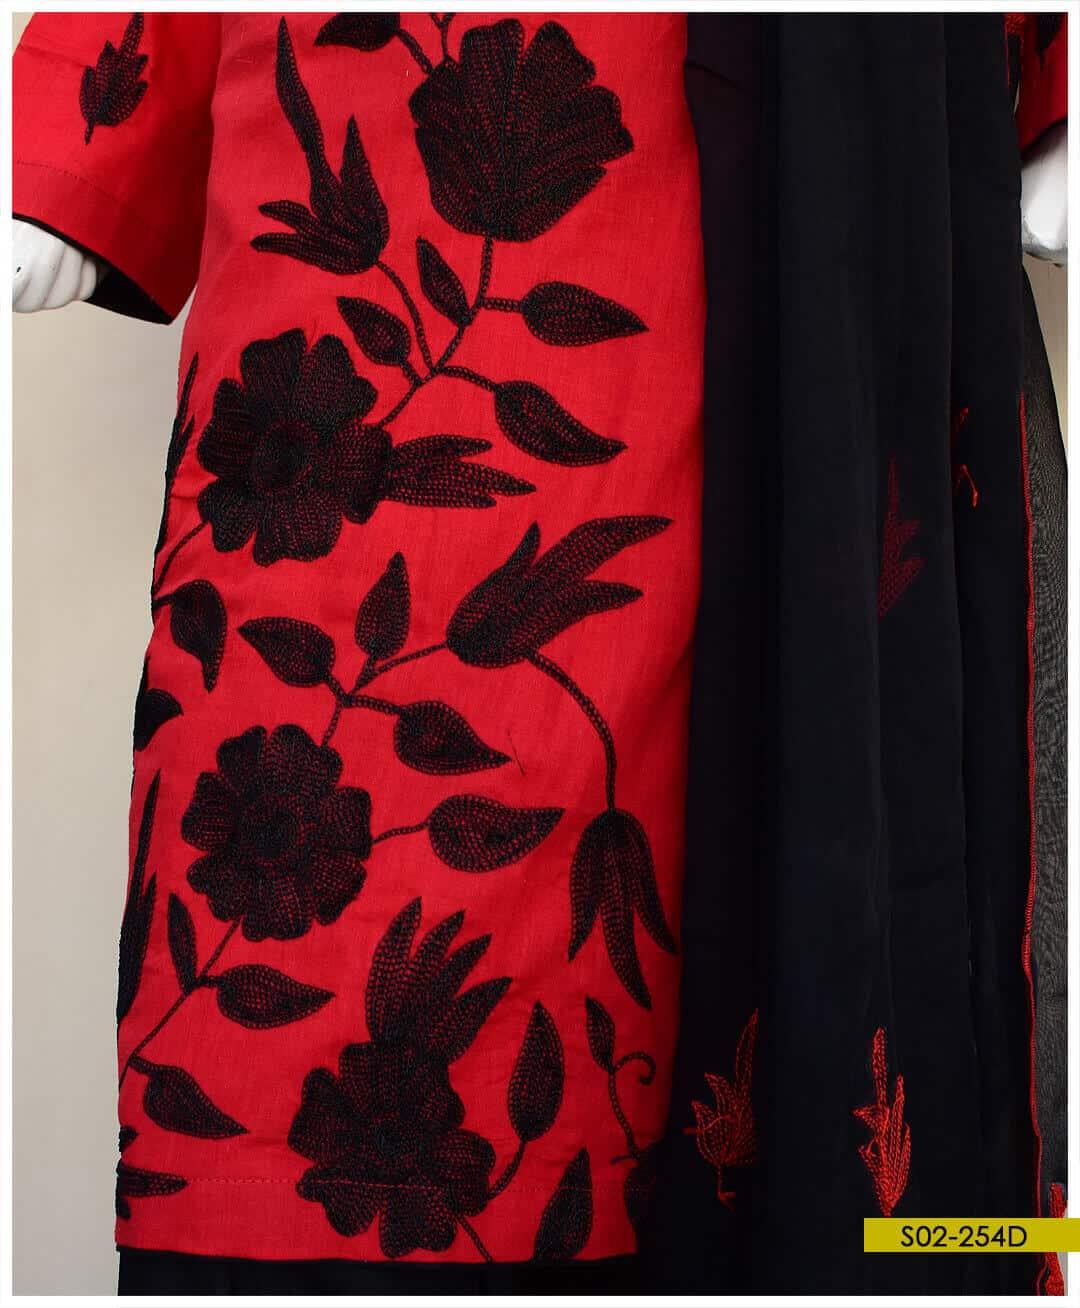 Aar Patta Work on 3 PCs Lawn Un-Stitched Suit with Chiffon Dupatta - S02-254D